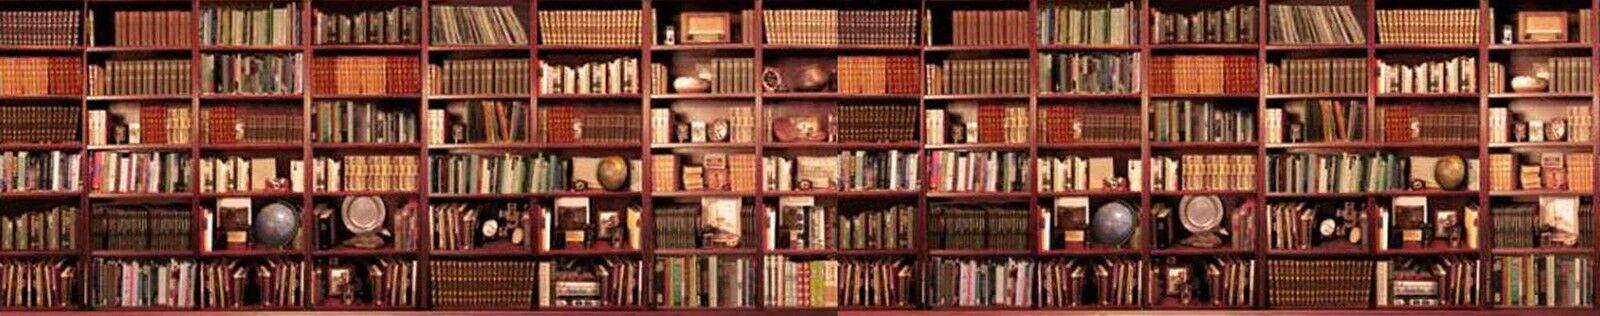 Overcrowded Bookshelf